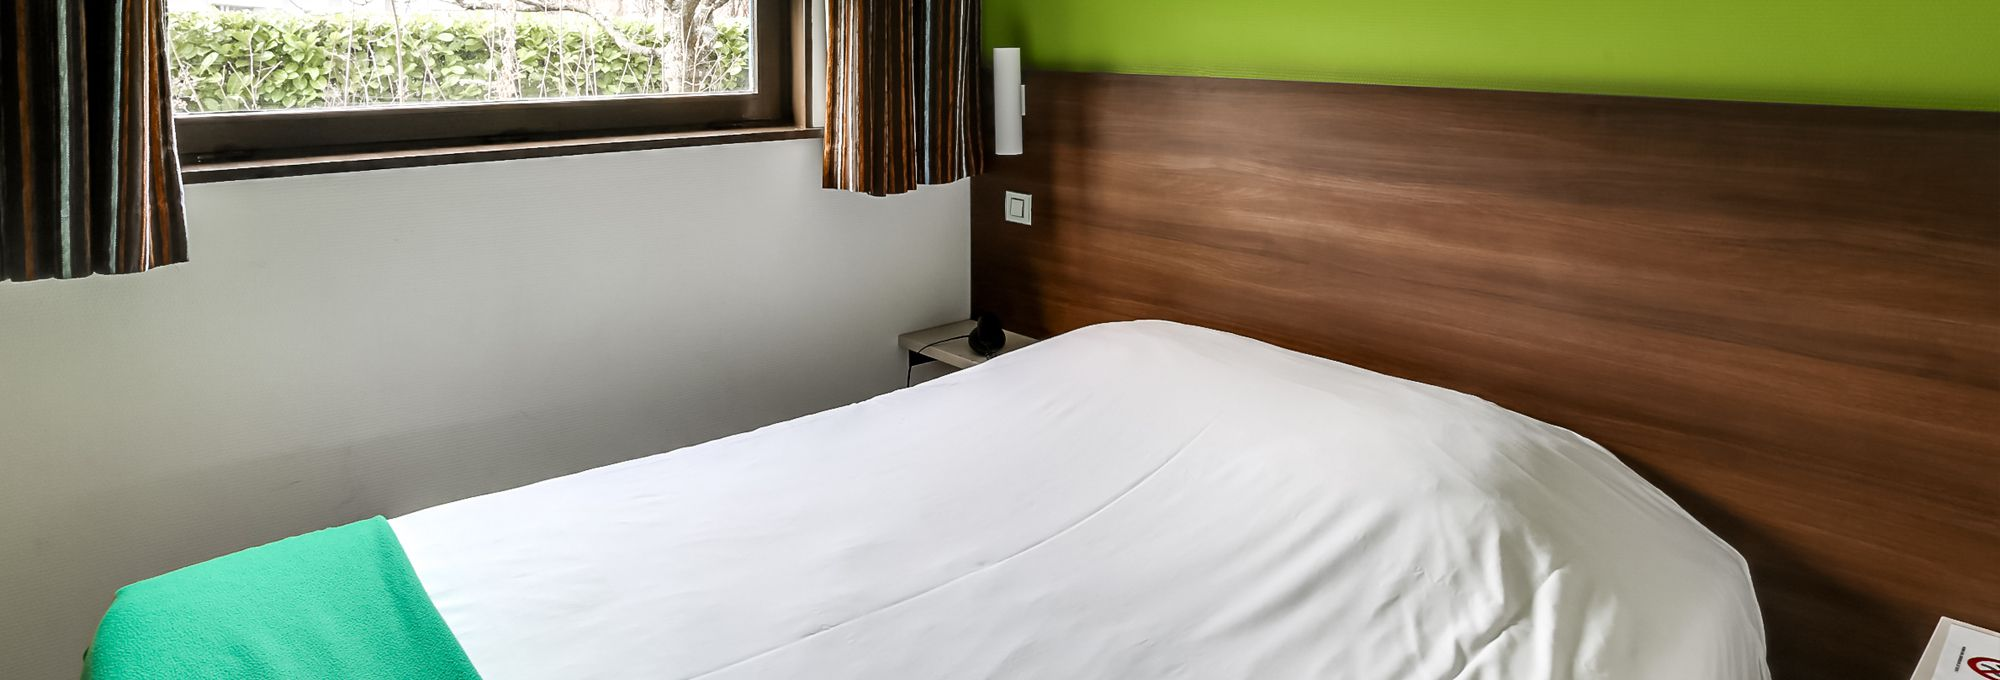 Brit Hotel Lyon Eurexpo Bron France